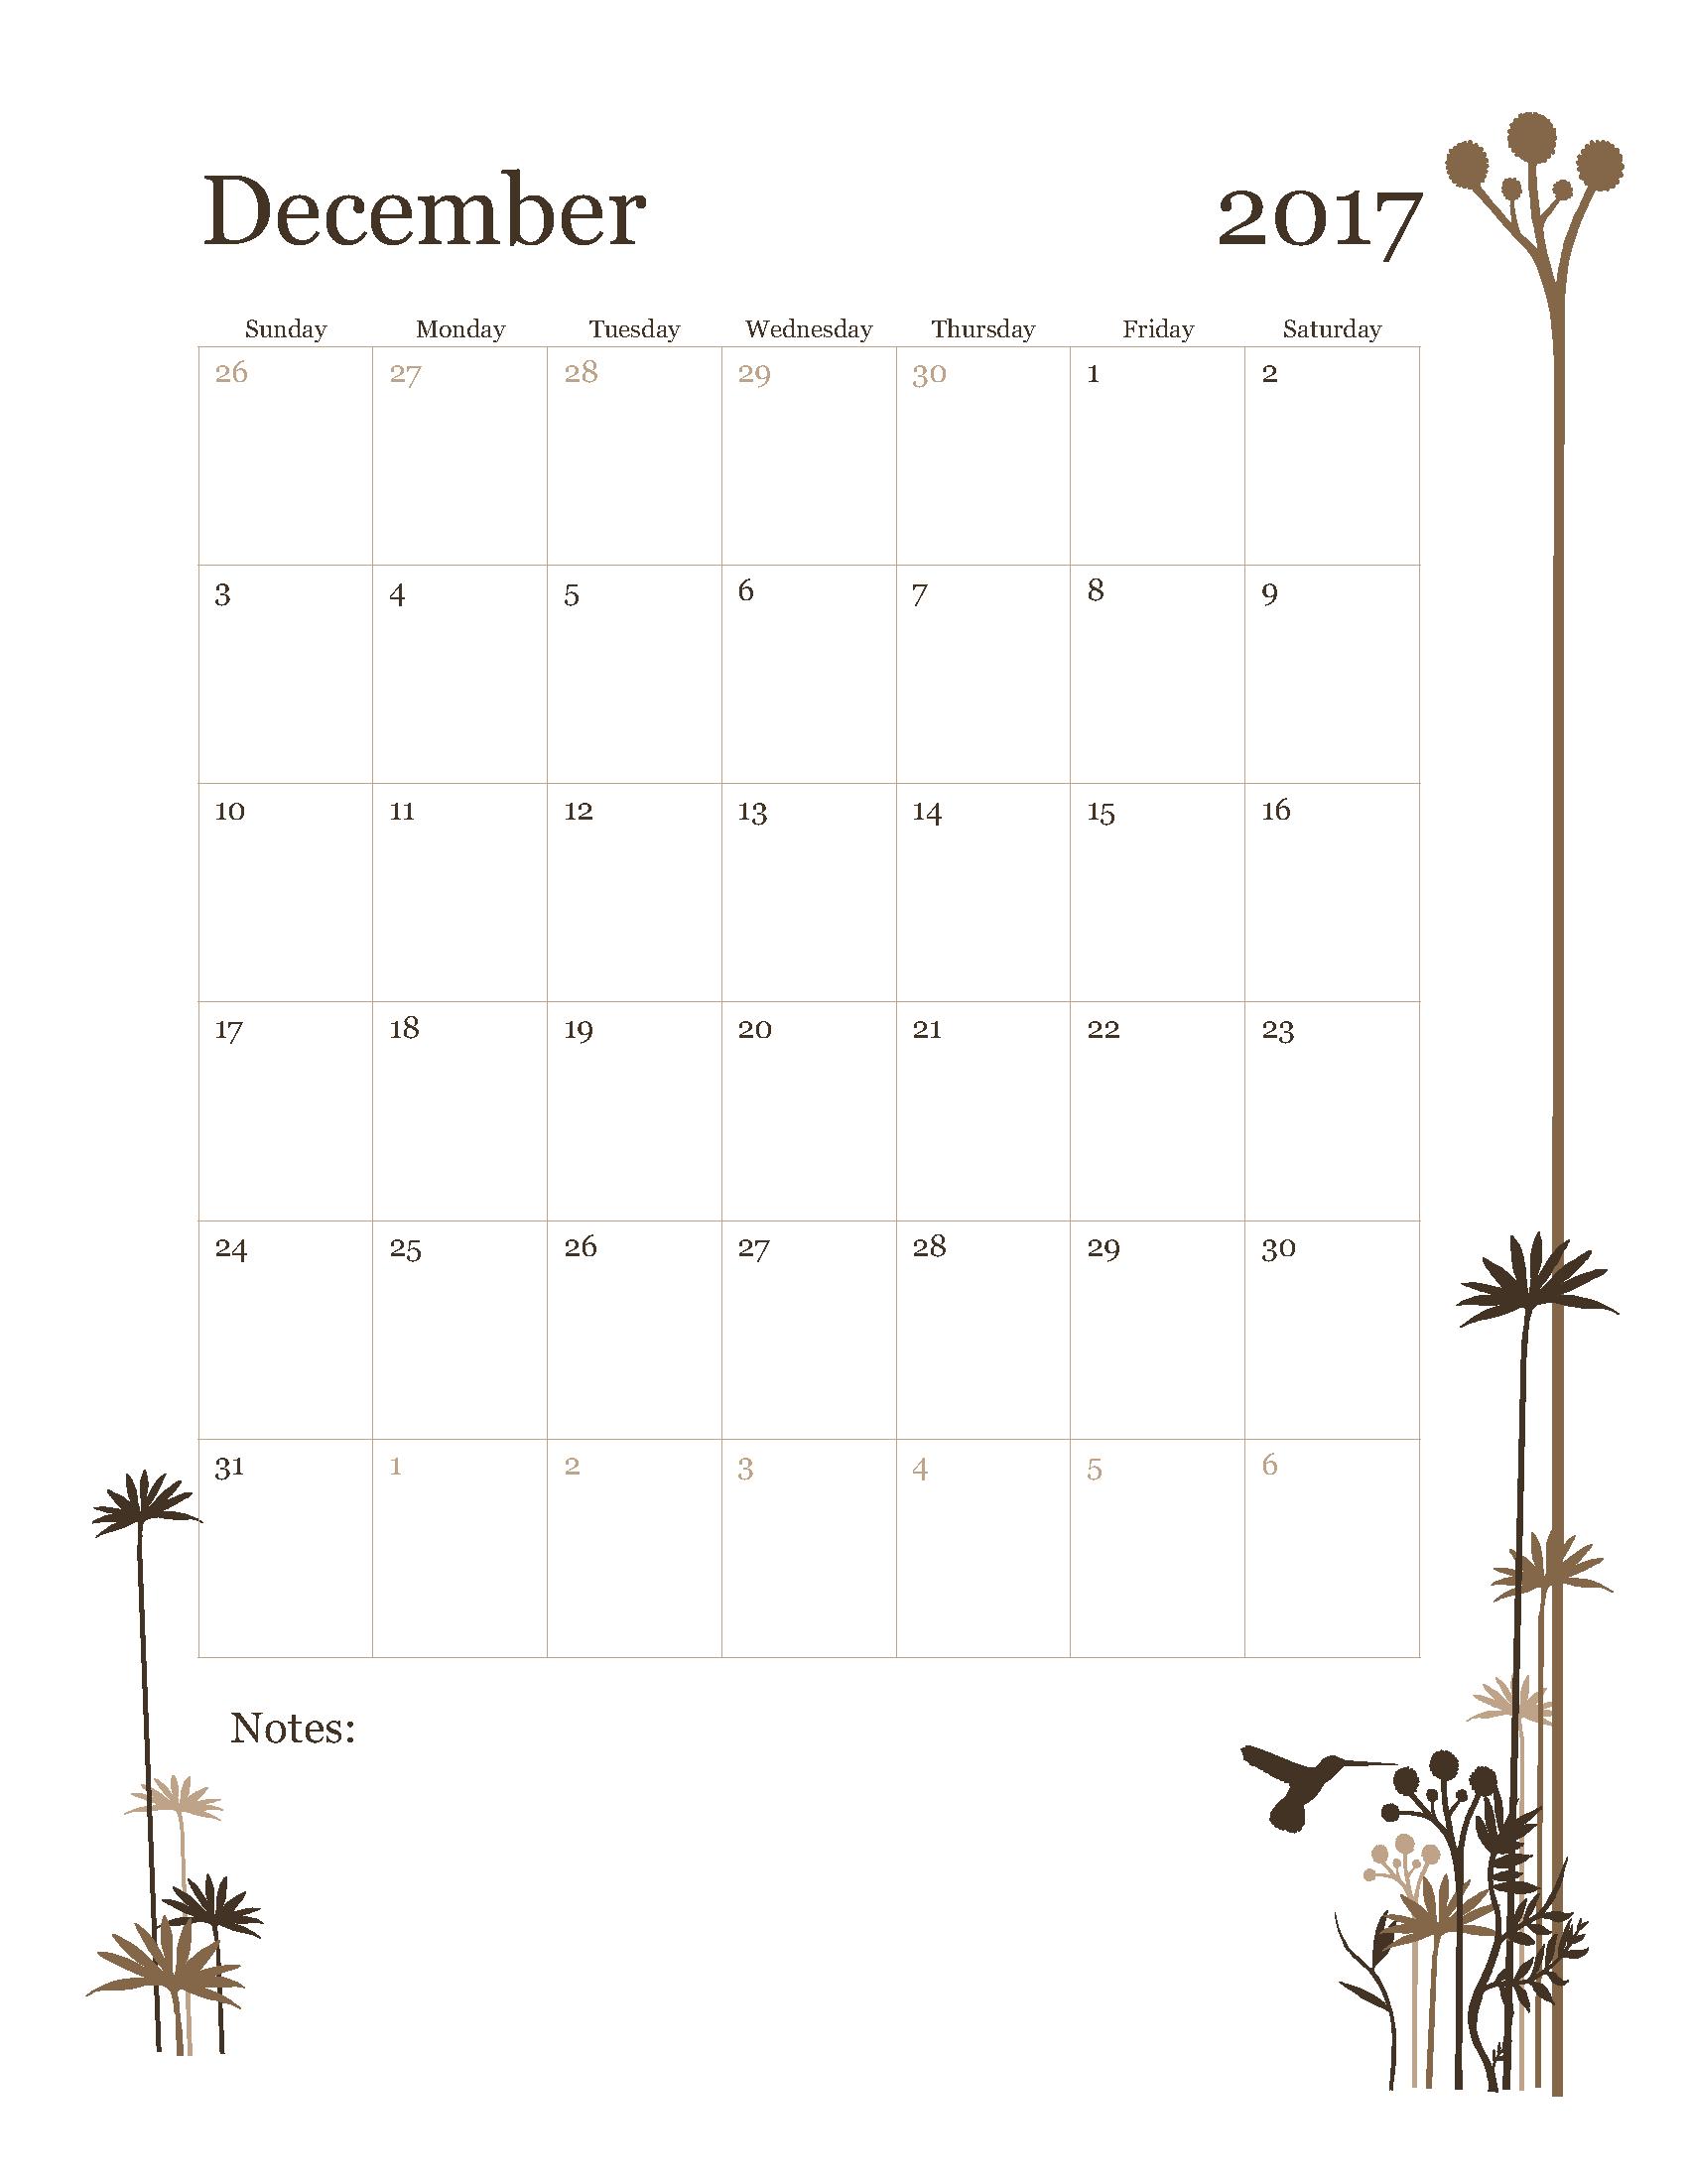 Free December 2017 Calendar Template Printable Start on Sunday - HummingBird design